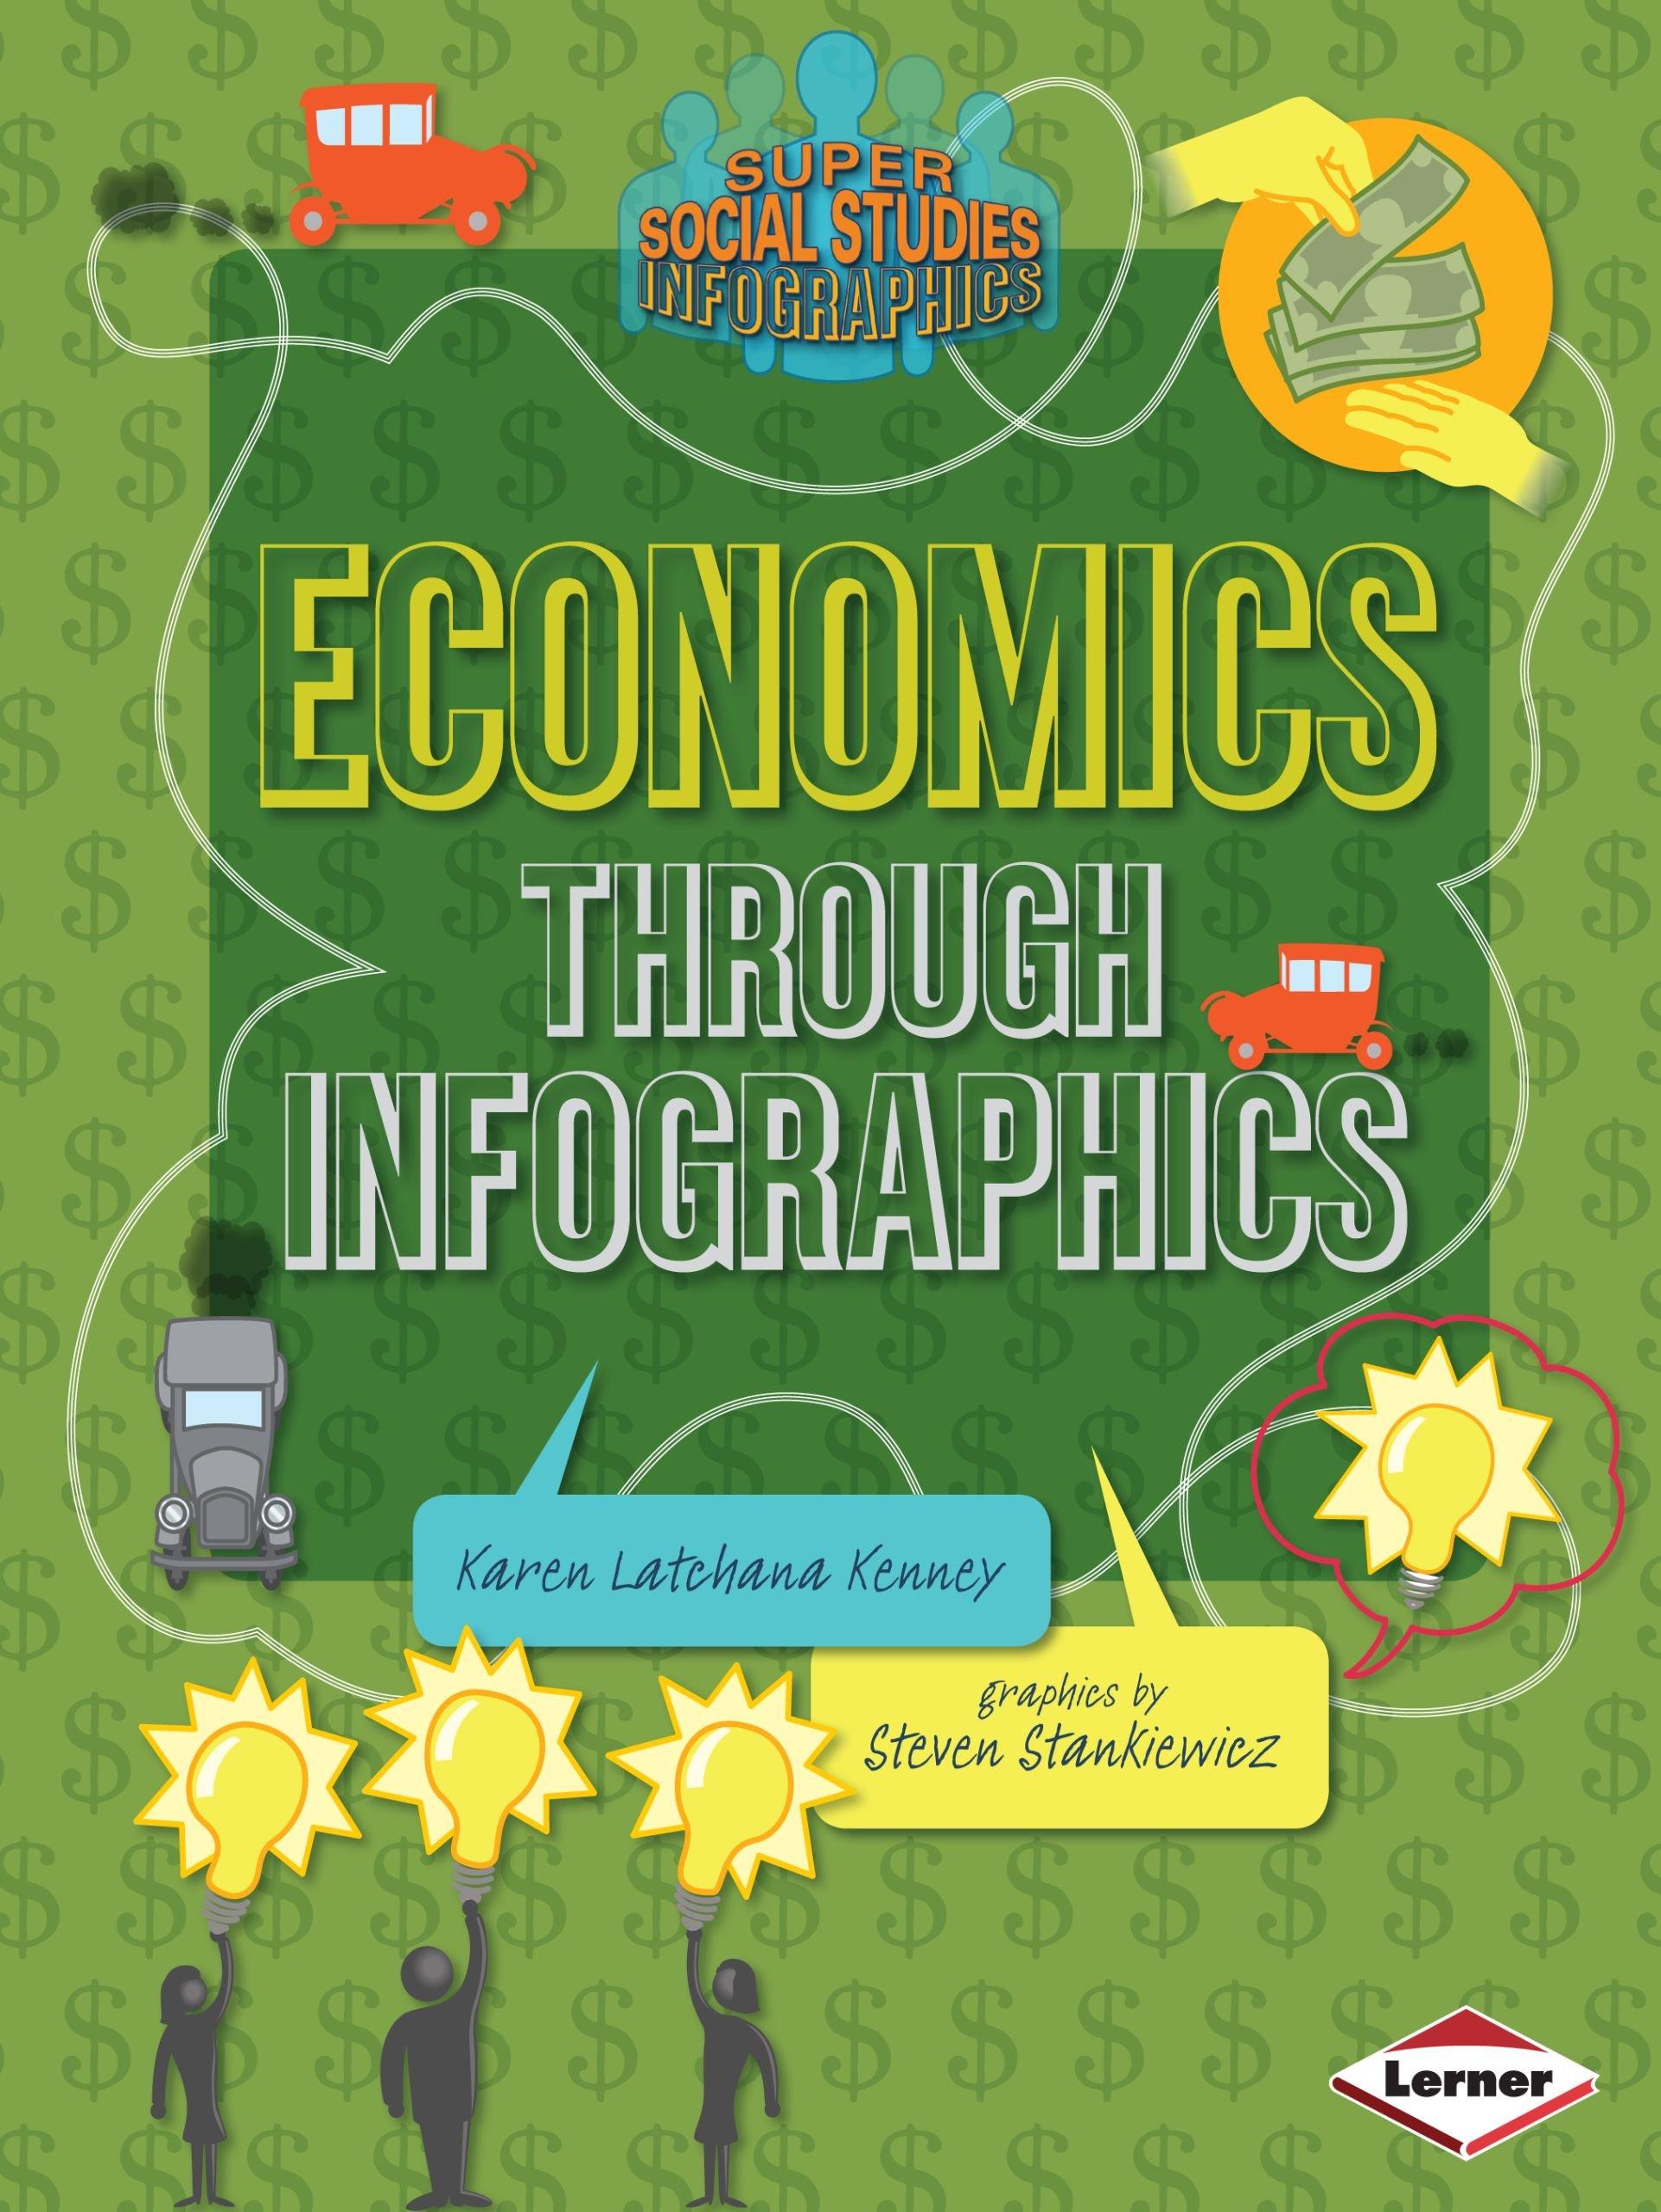 Amazon.com: Economics Through Infographics (Super Social Studies  Infographics) (9781467745642): Karen Latchana Kenney, Steven Stankiewicz:  Books